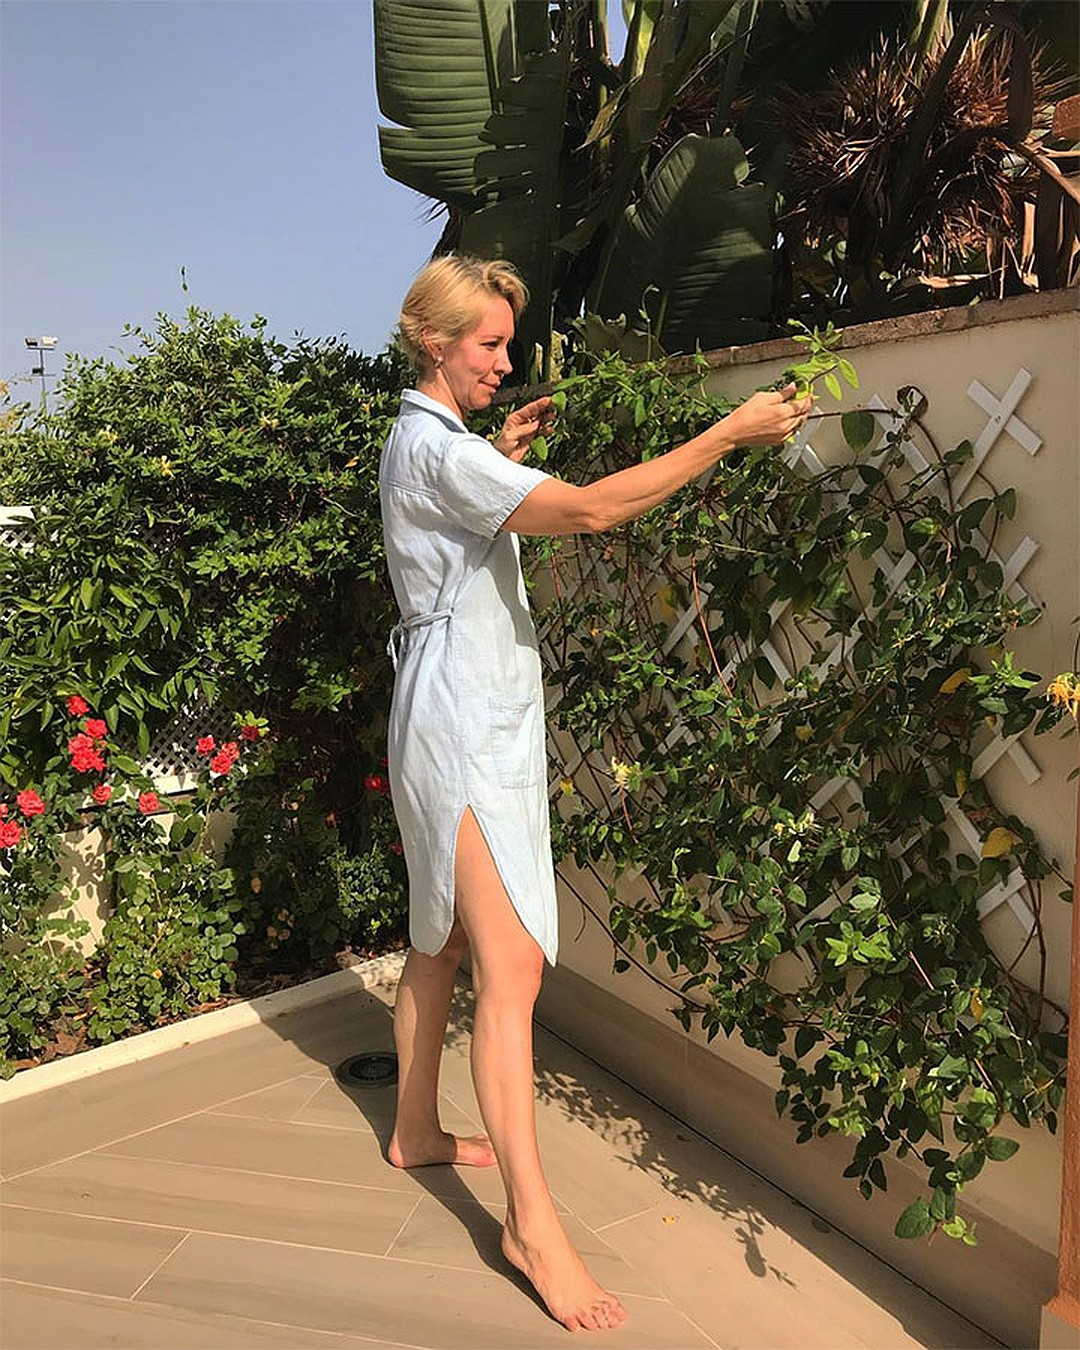 Татьяна Лазарева наводит красоту у арендованного испанского дома. Фото: instagram.com/lazareva_tatka/